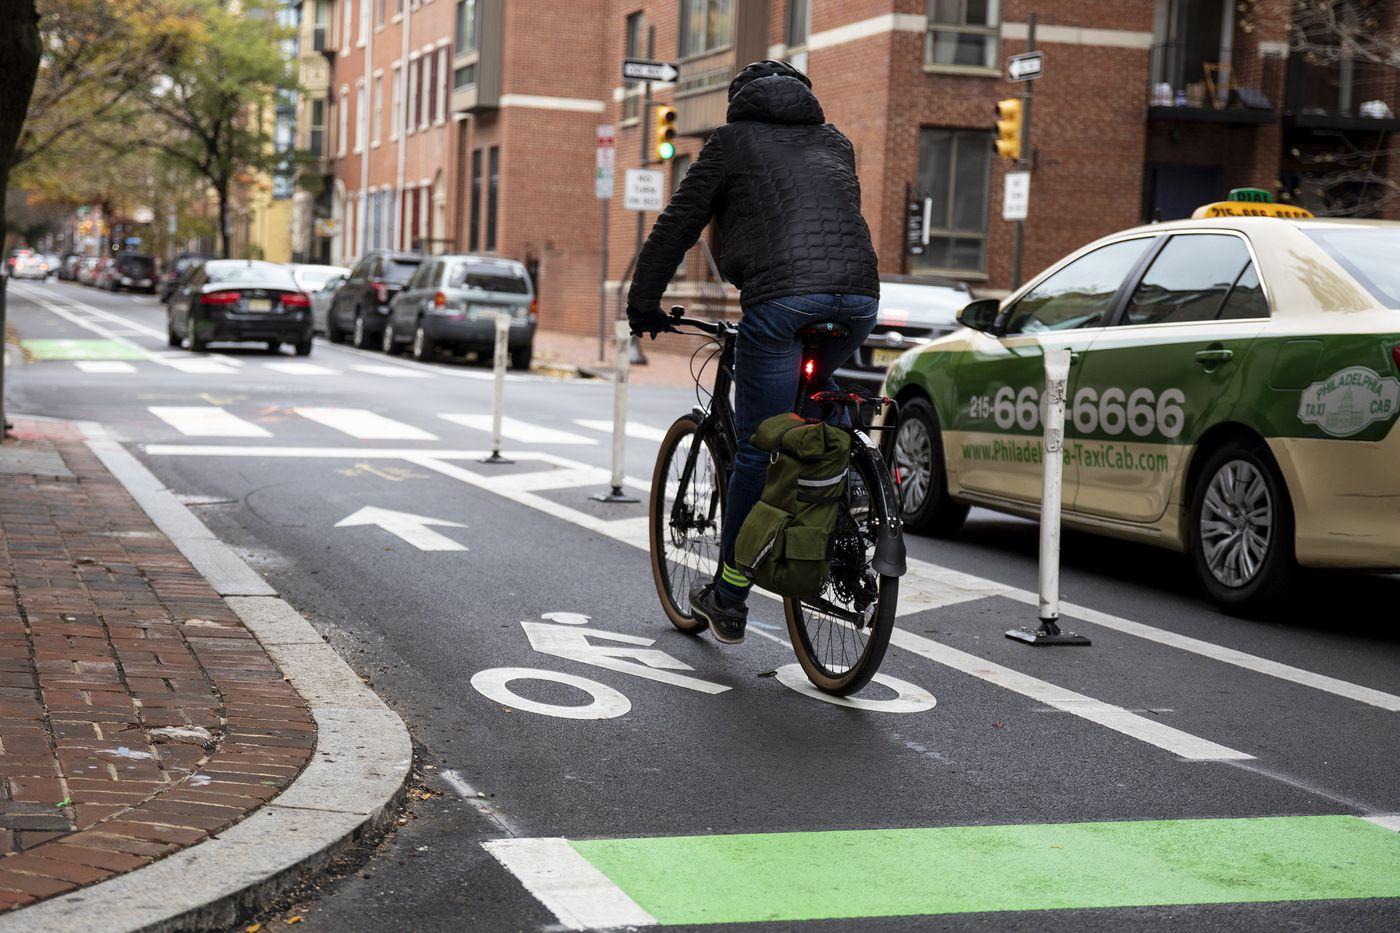 A biker rides along the sectioned bike lane along Spruce Street near Ninth Street on Wednesday, Nov. 20, 2019.